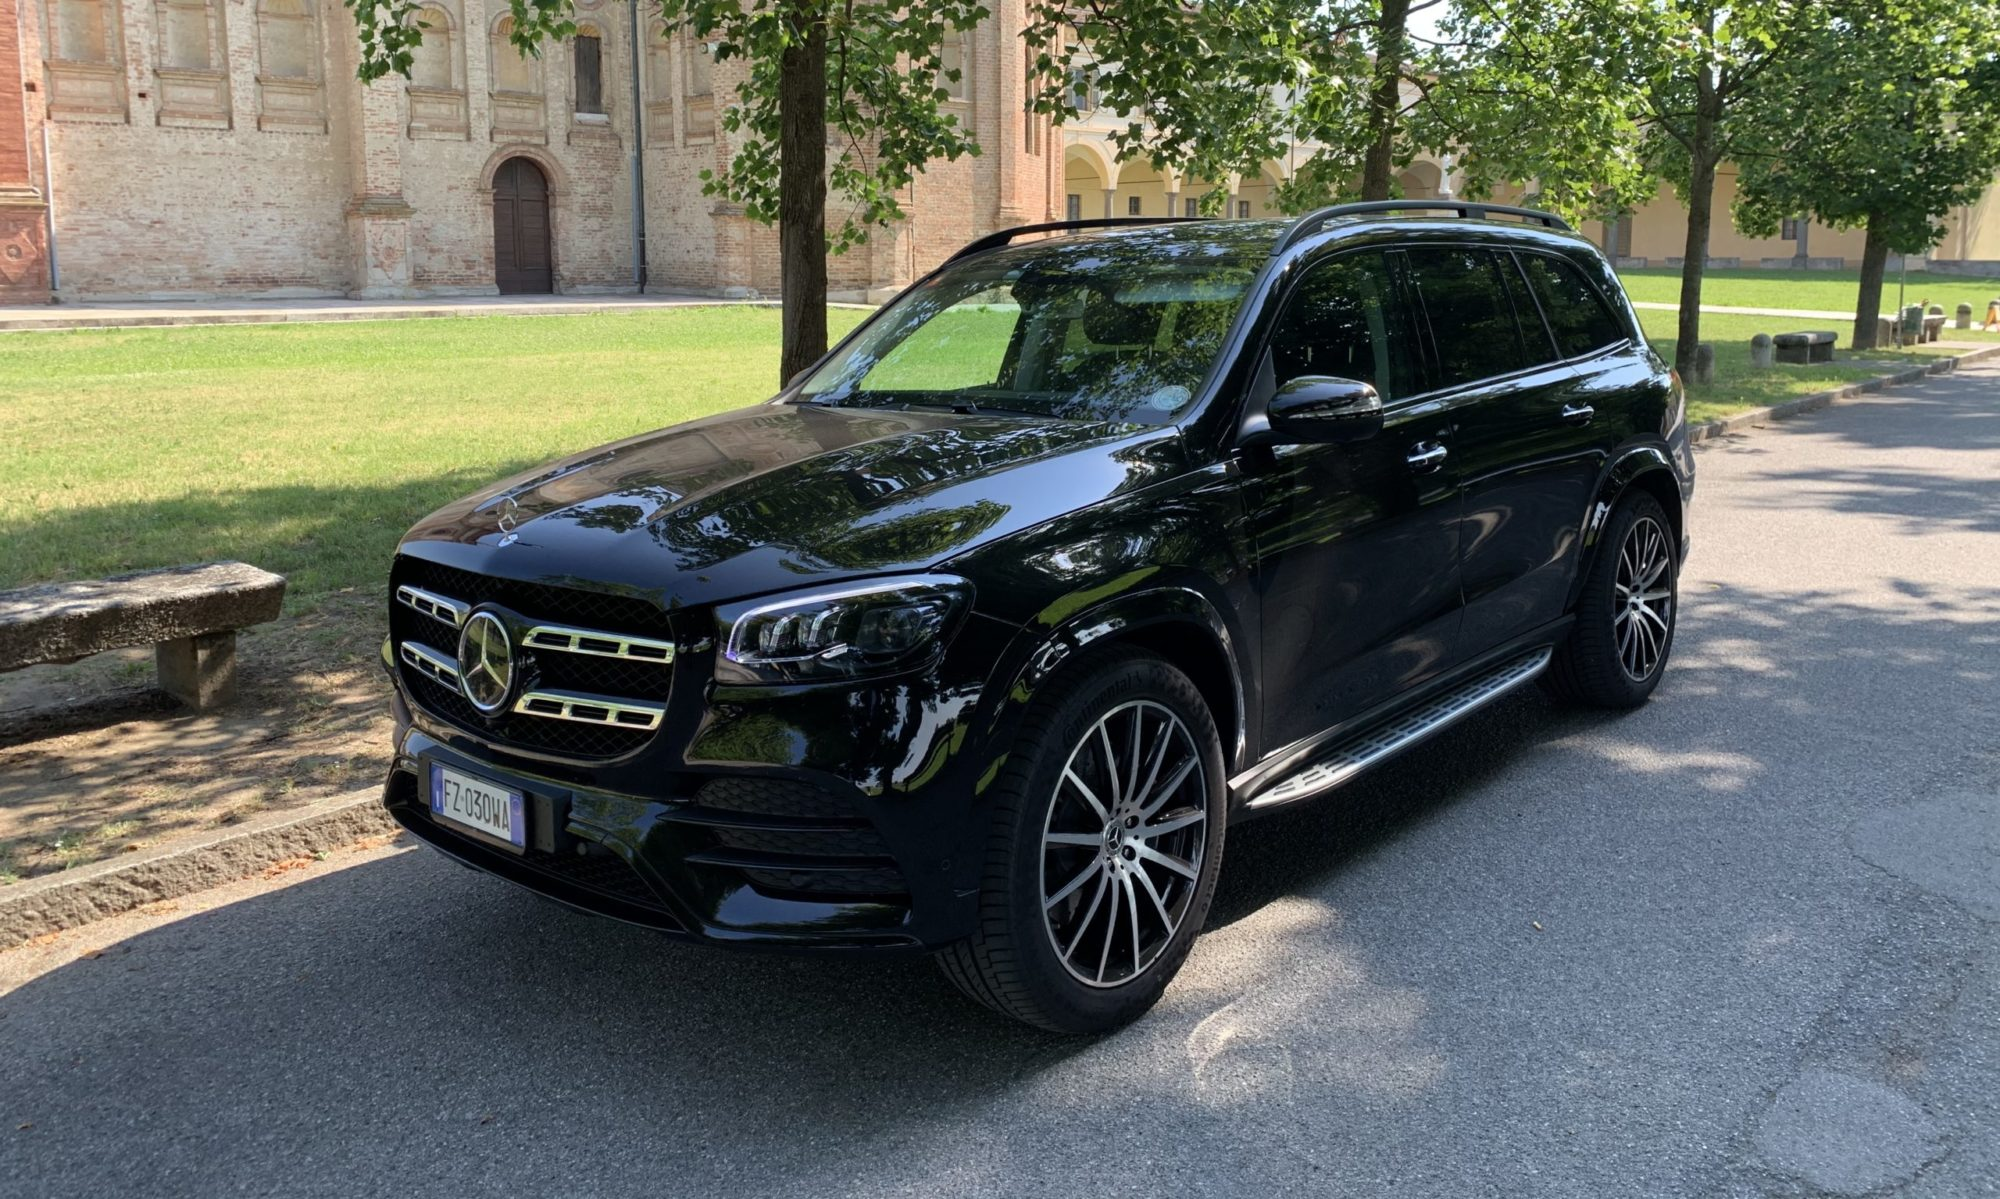 Luxury Care Limousine